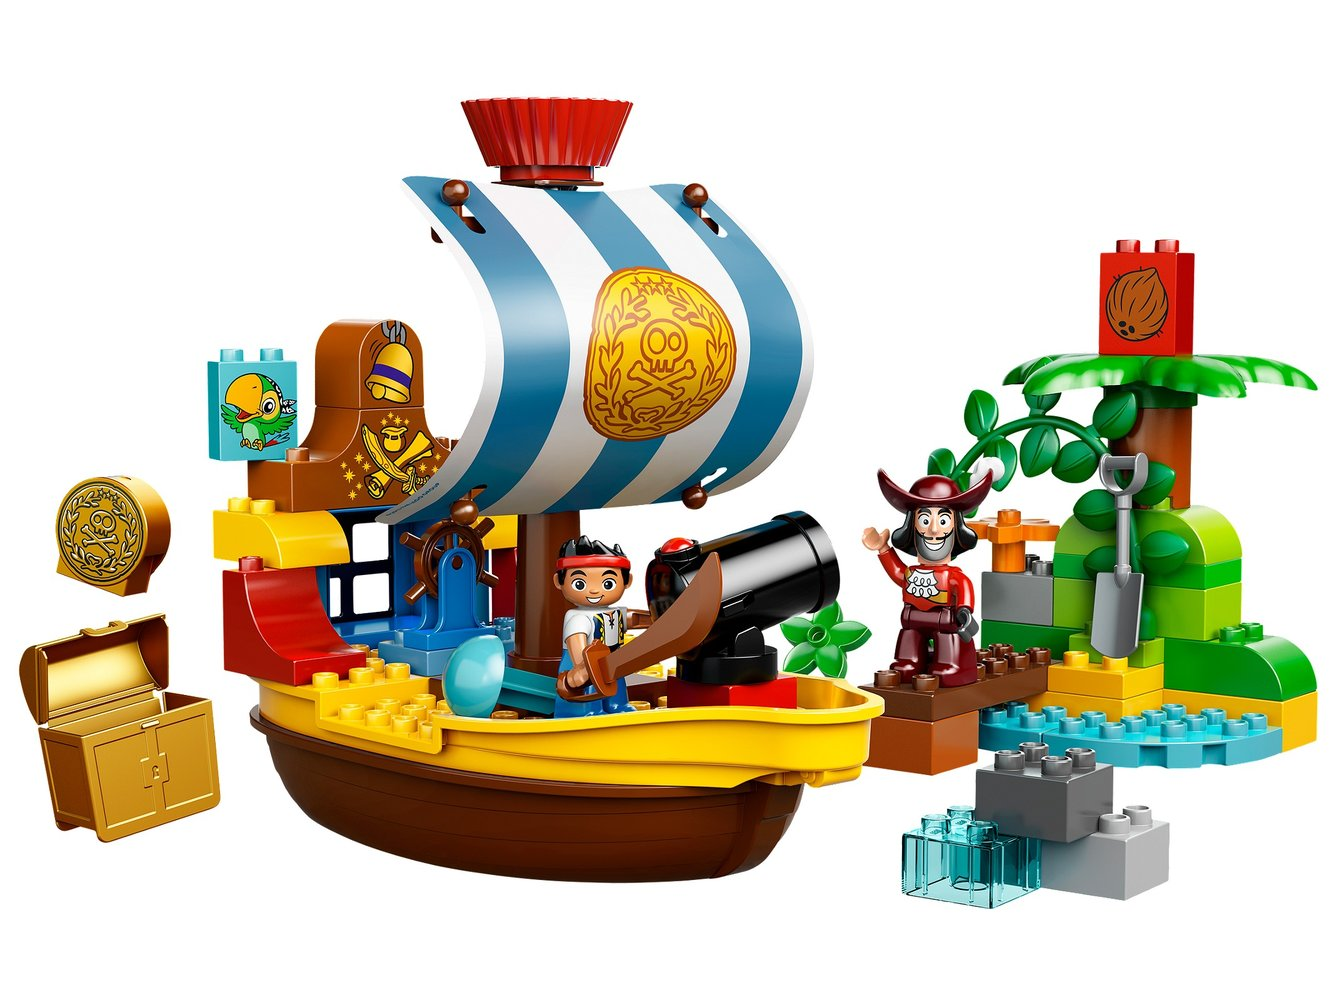 Jake's Pirate Ship Bucky